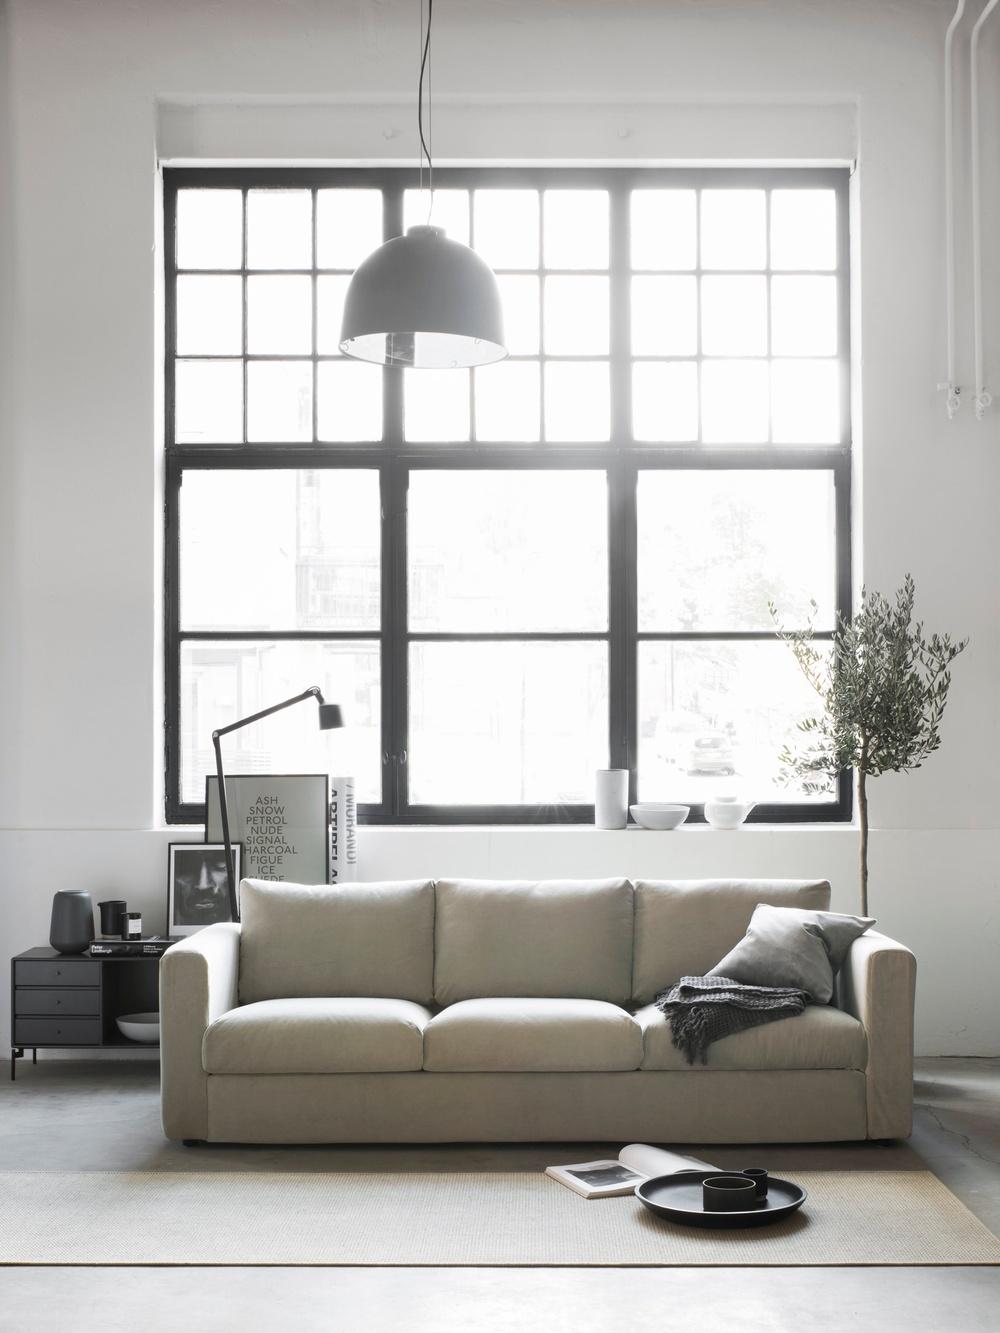 Bemz cover for Vimle 3 seater sofa, fabric: Malmen Velvet Sand Beige. Bemz cushion cover, fabric: Malmen Velvet Zinc Grey. Styled by Pella Hedeby. Photographer Sara Medina Lind.